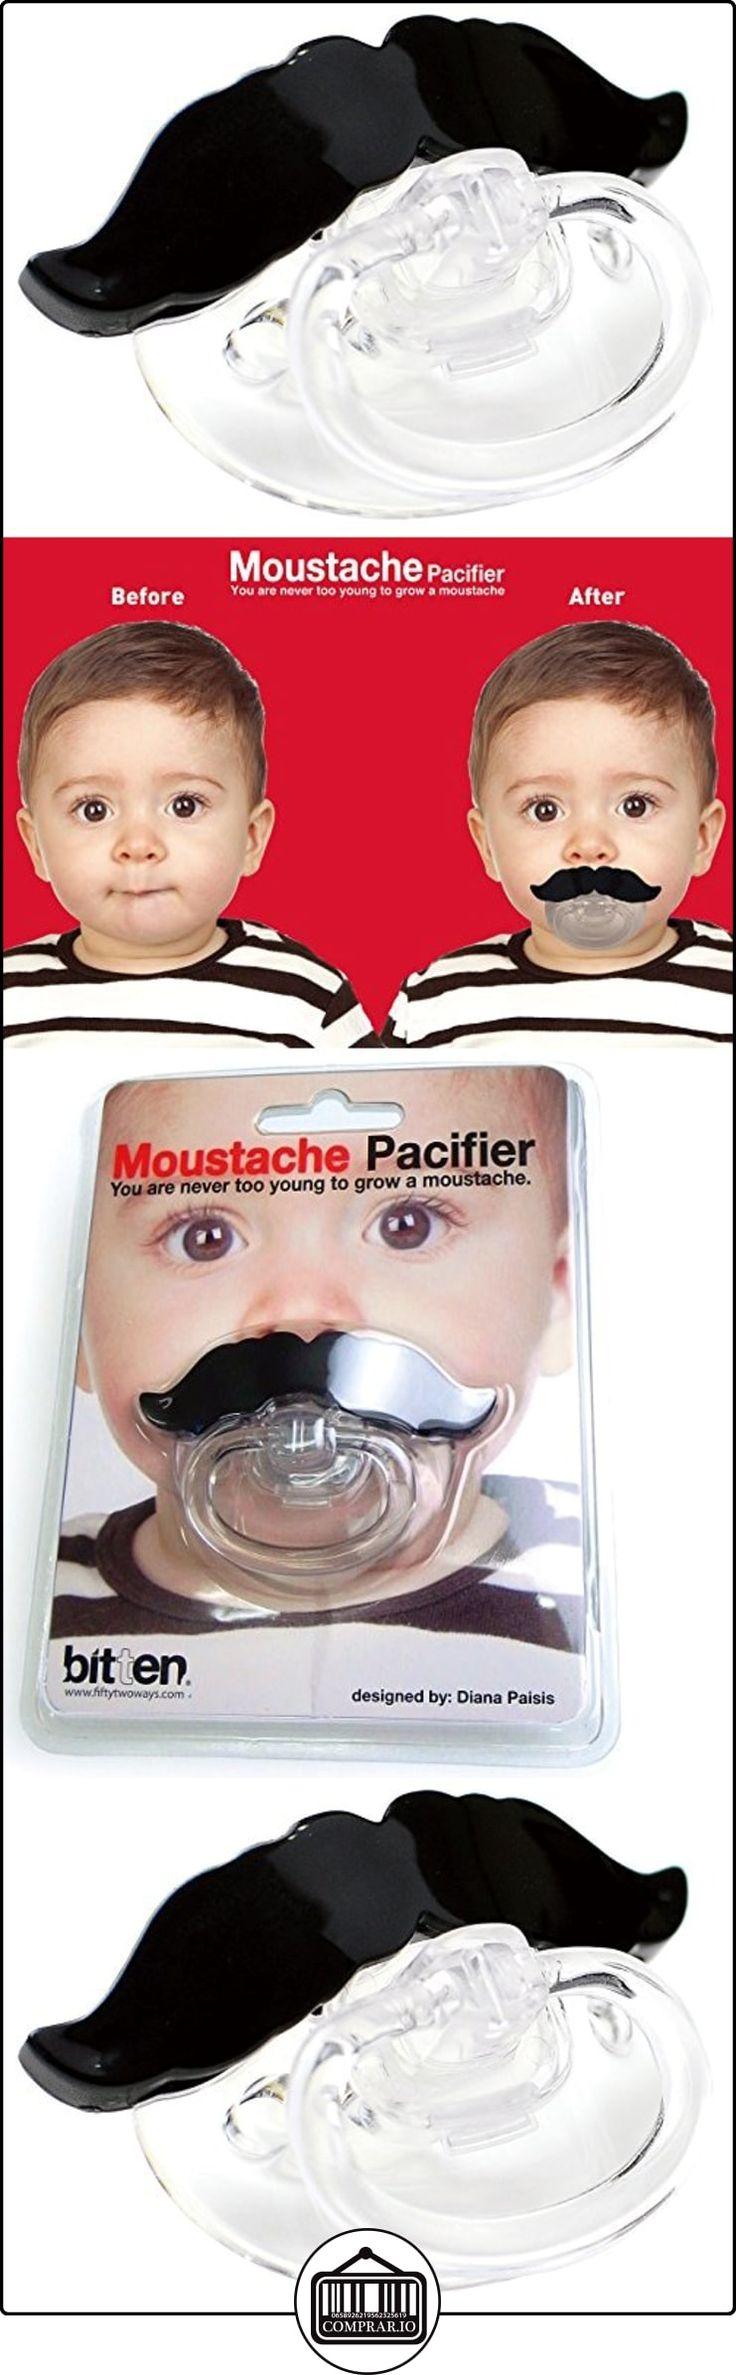 Chupete con bigote  ✿ Regalos para recién nacidos - Bebes ✿ ▬► Ver oferta: http://comprar.io/goto/B0091DHACS